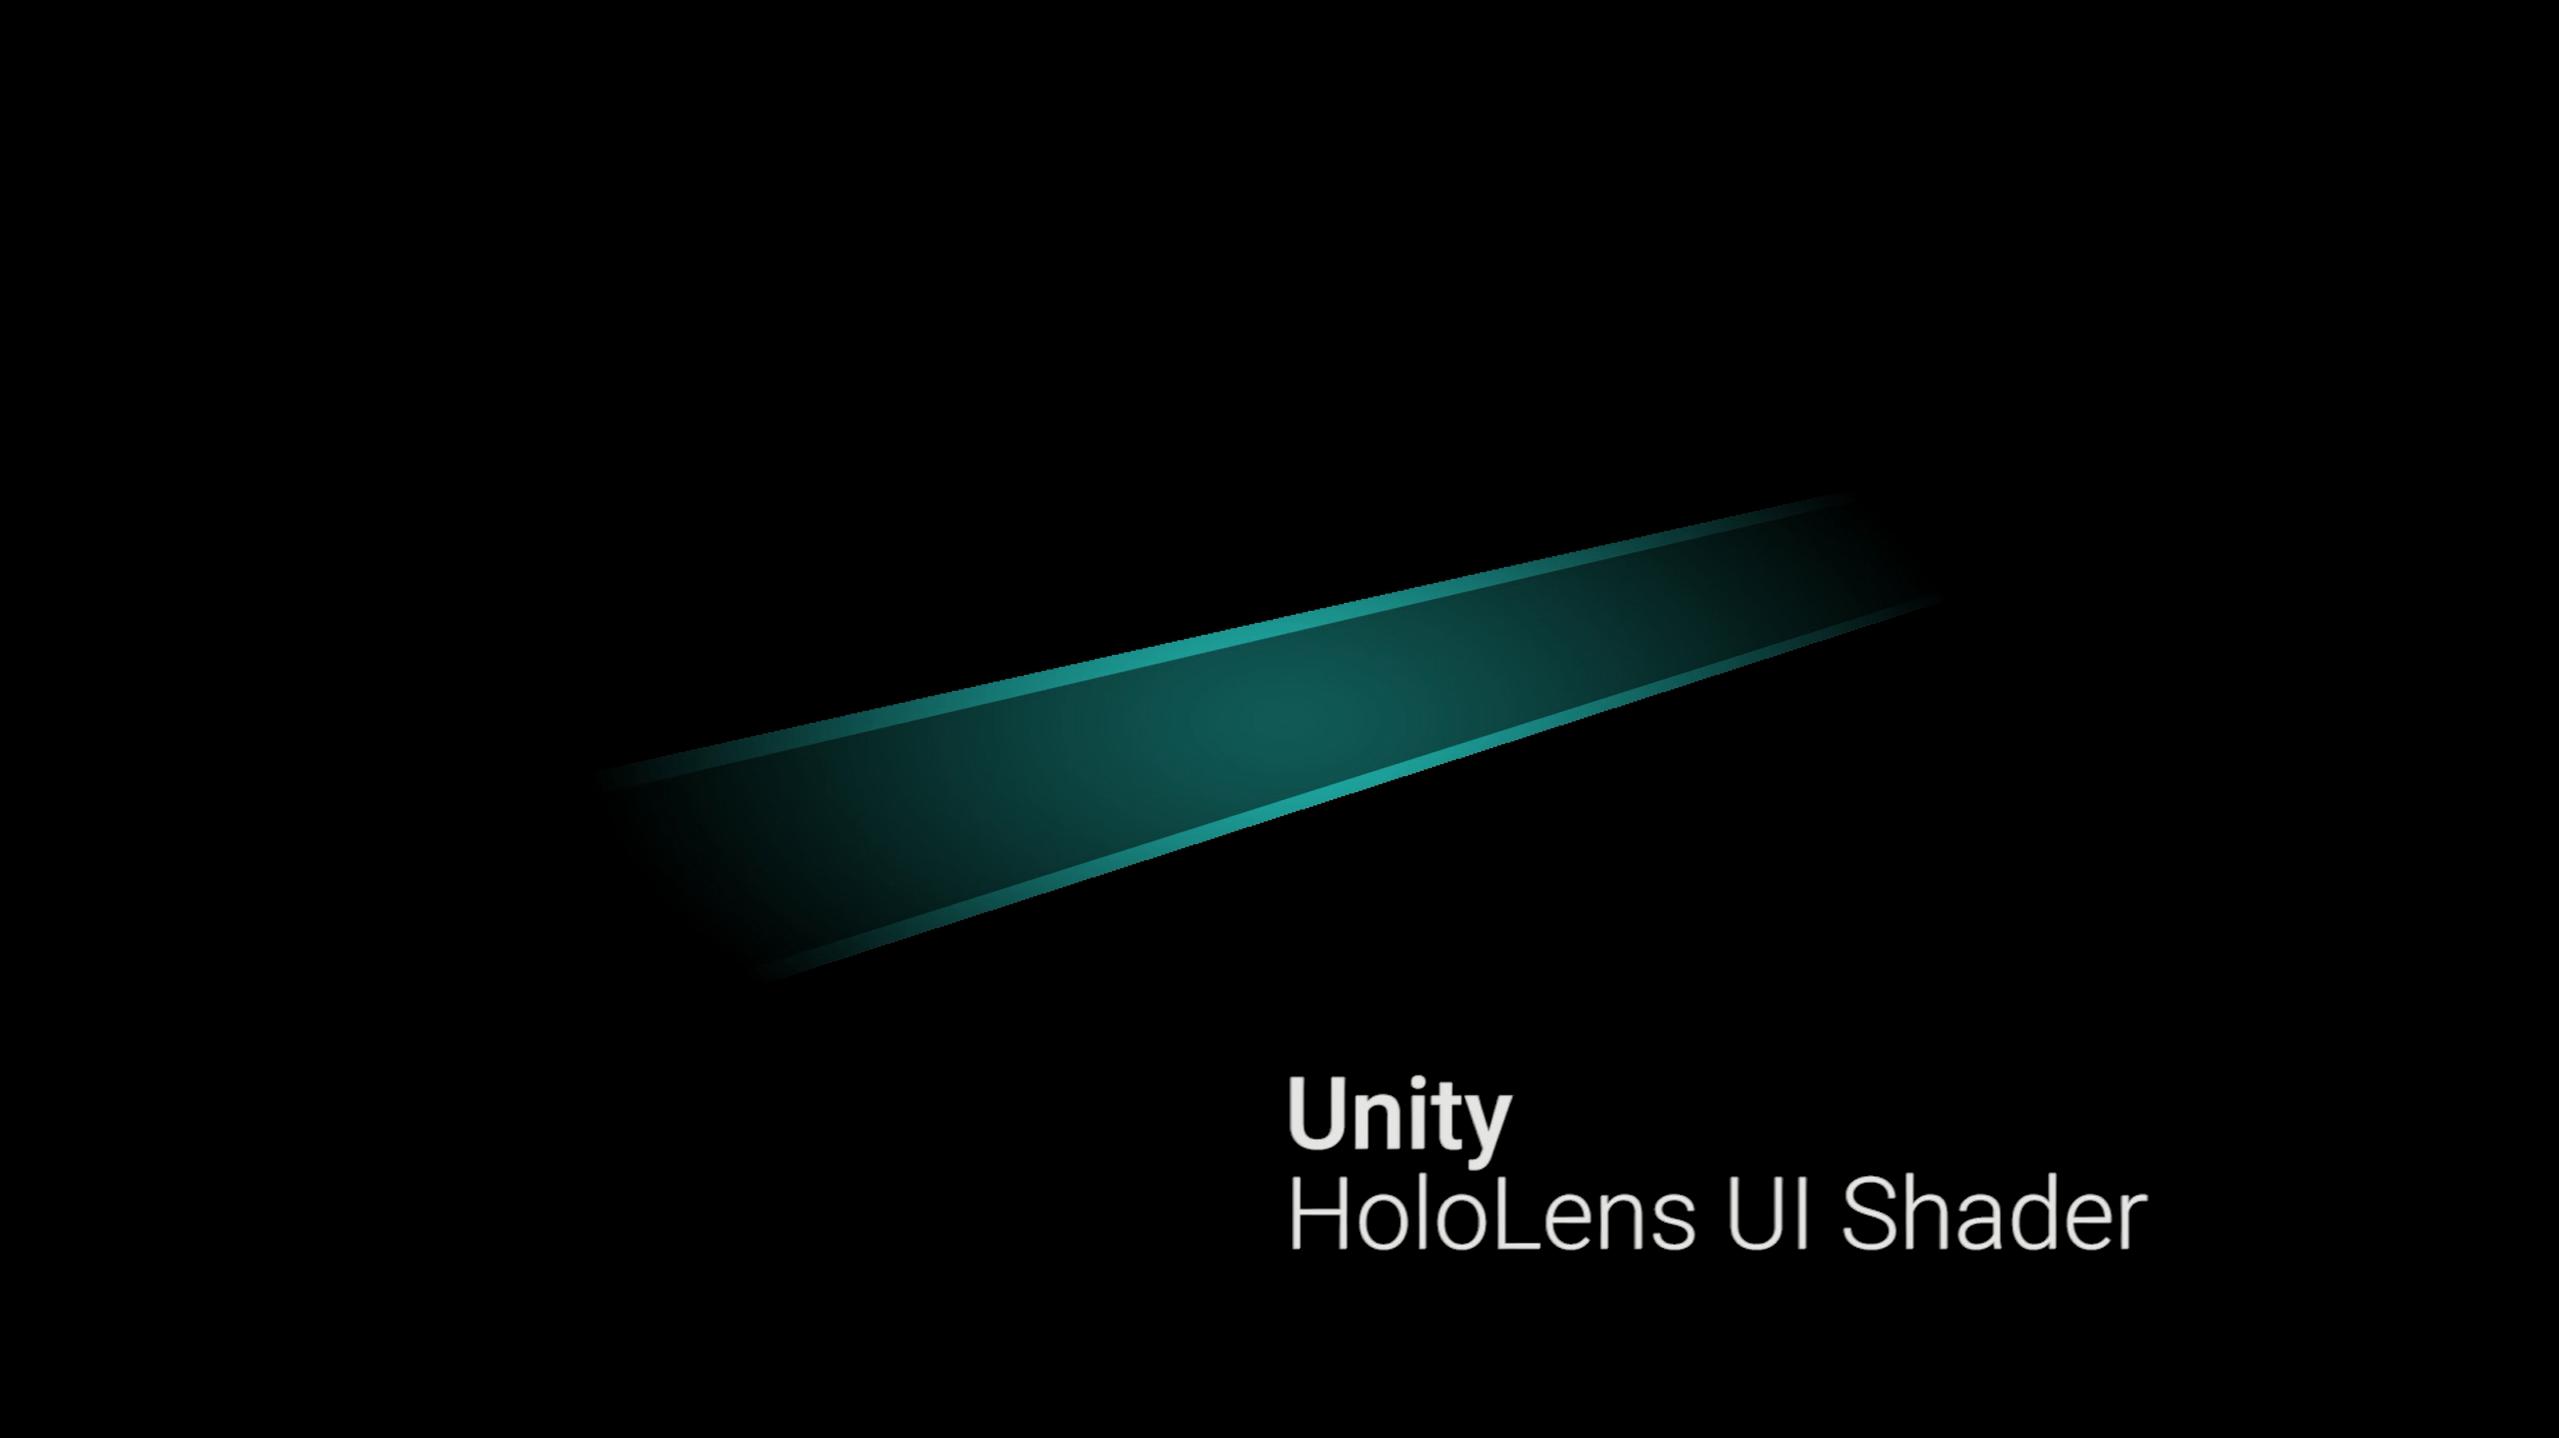 Unity HoloLens UI Shader